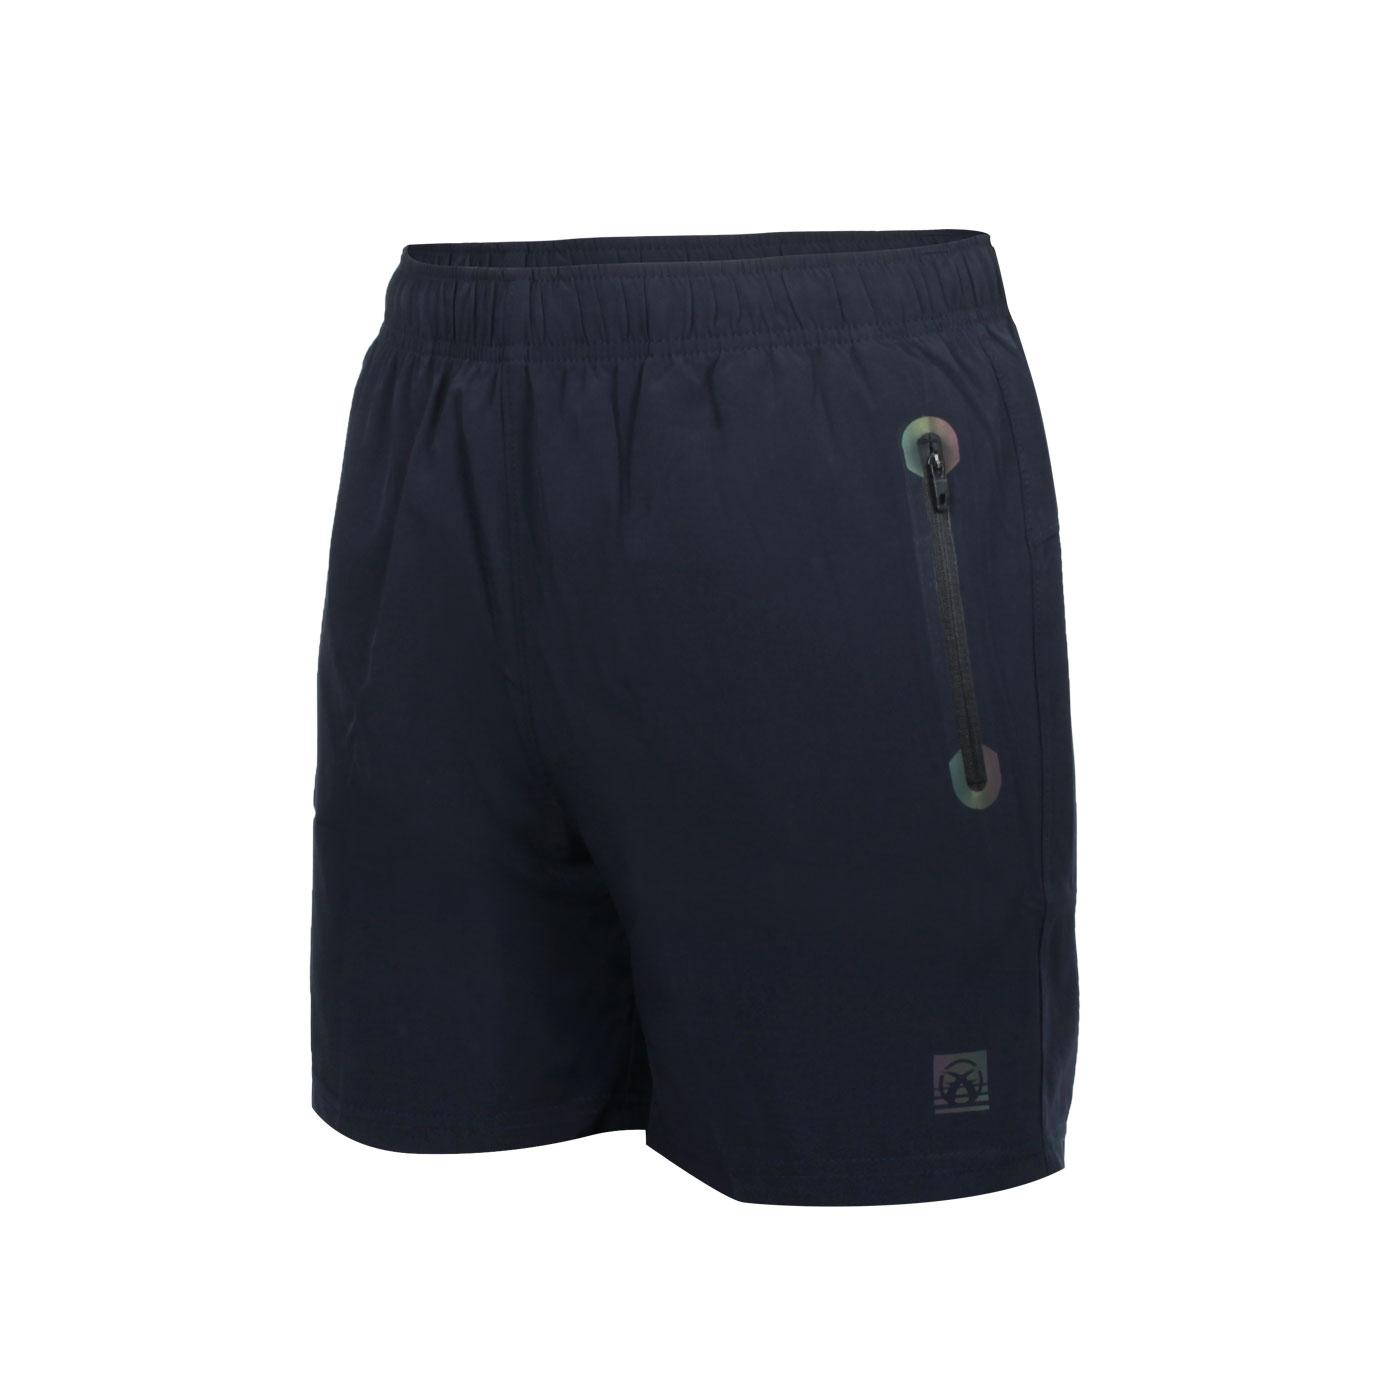 FIRESTAR 女款彈性平織短褲 CL123-93